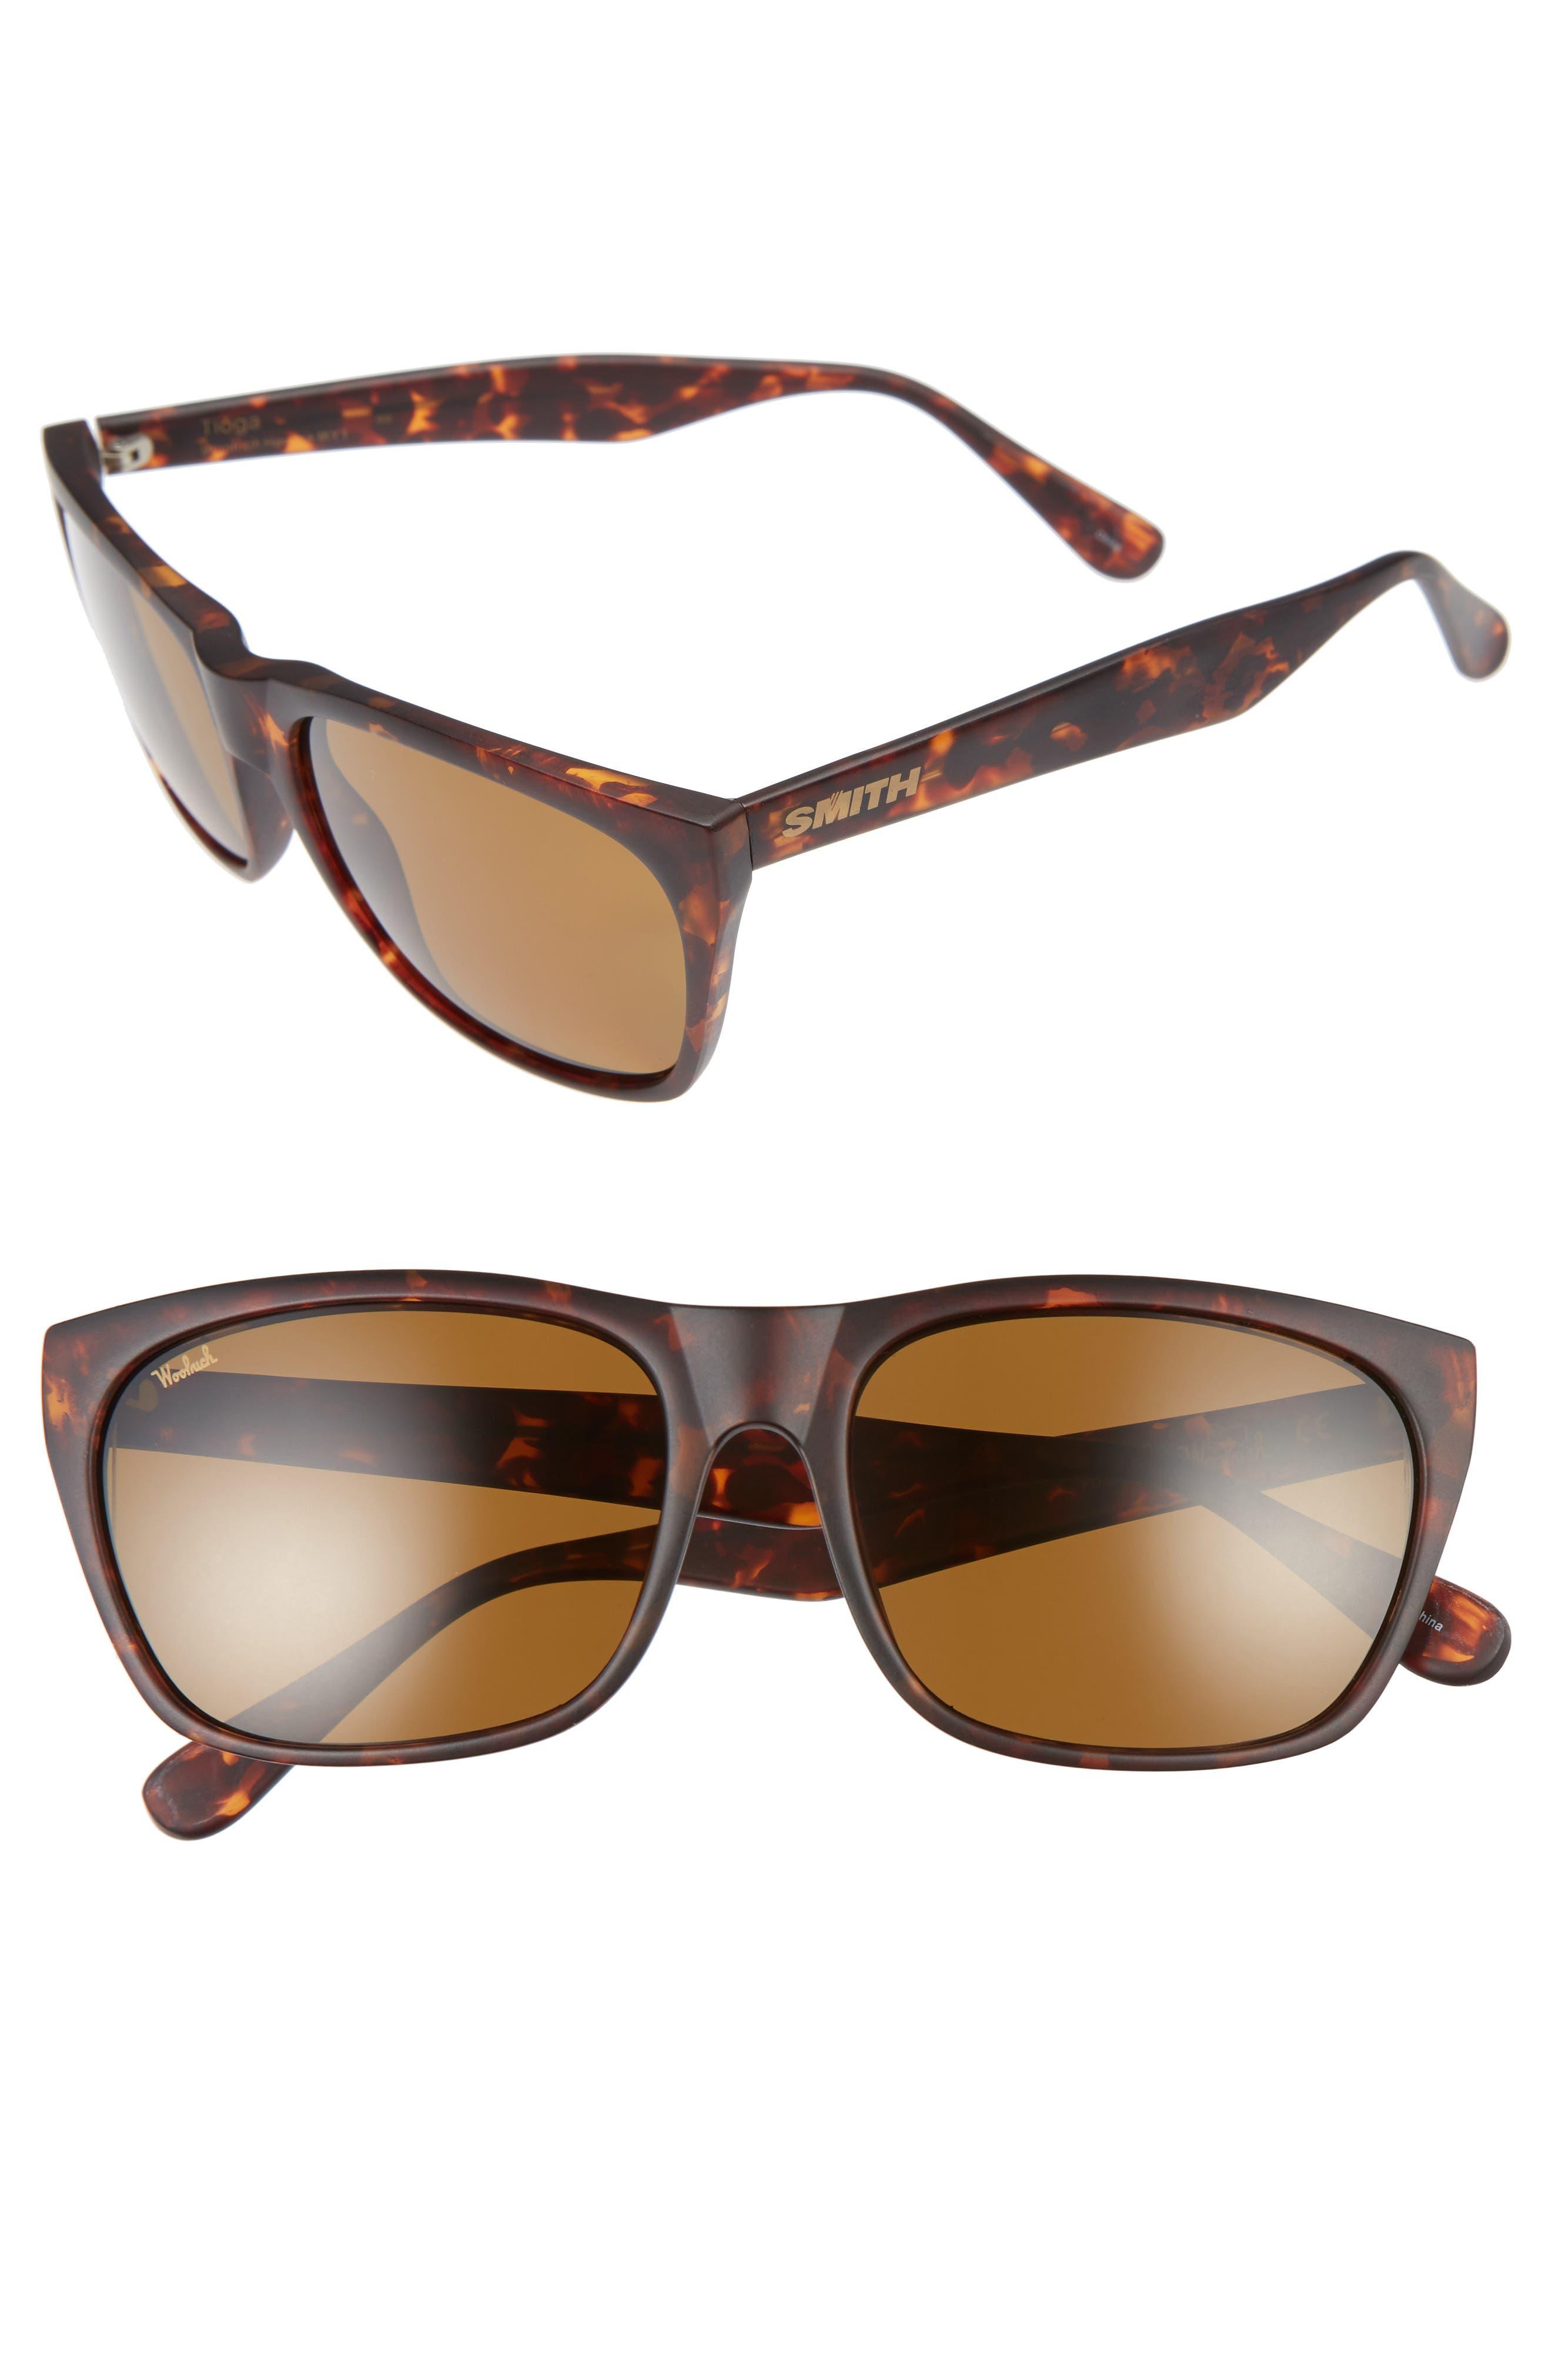 Tioga 57mm Polarized Sunglasses,                             Main thumbnail 1, color,                             Vintage Havana Matte